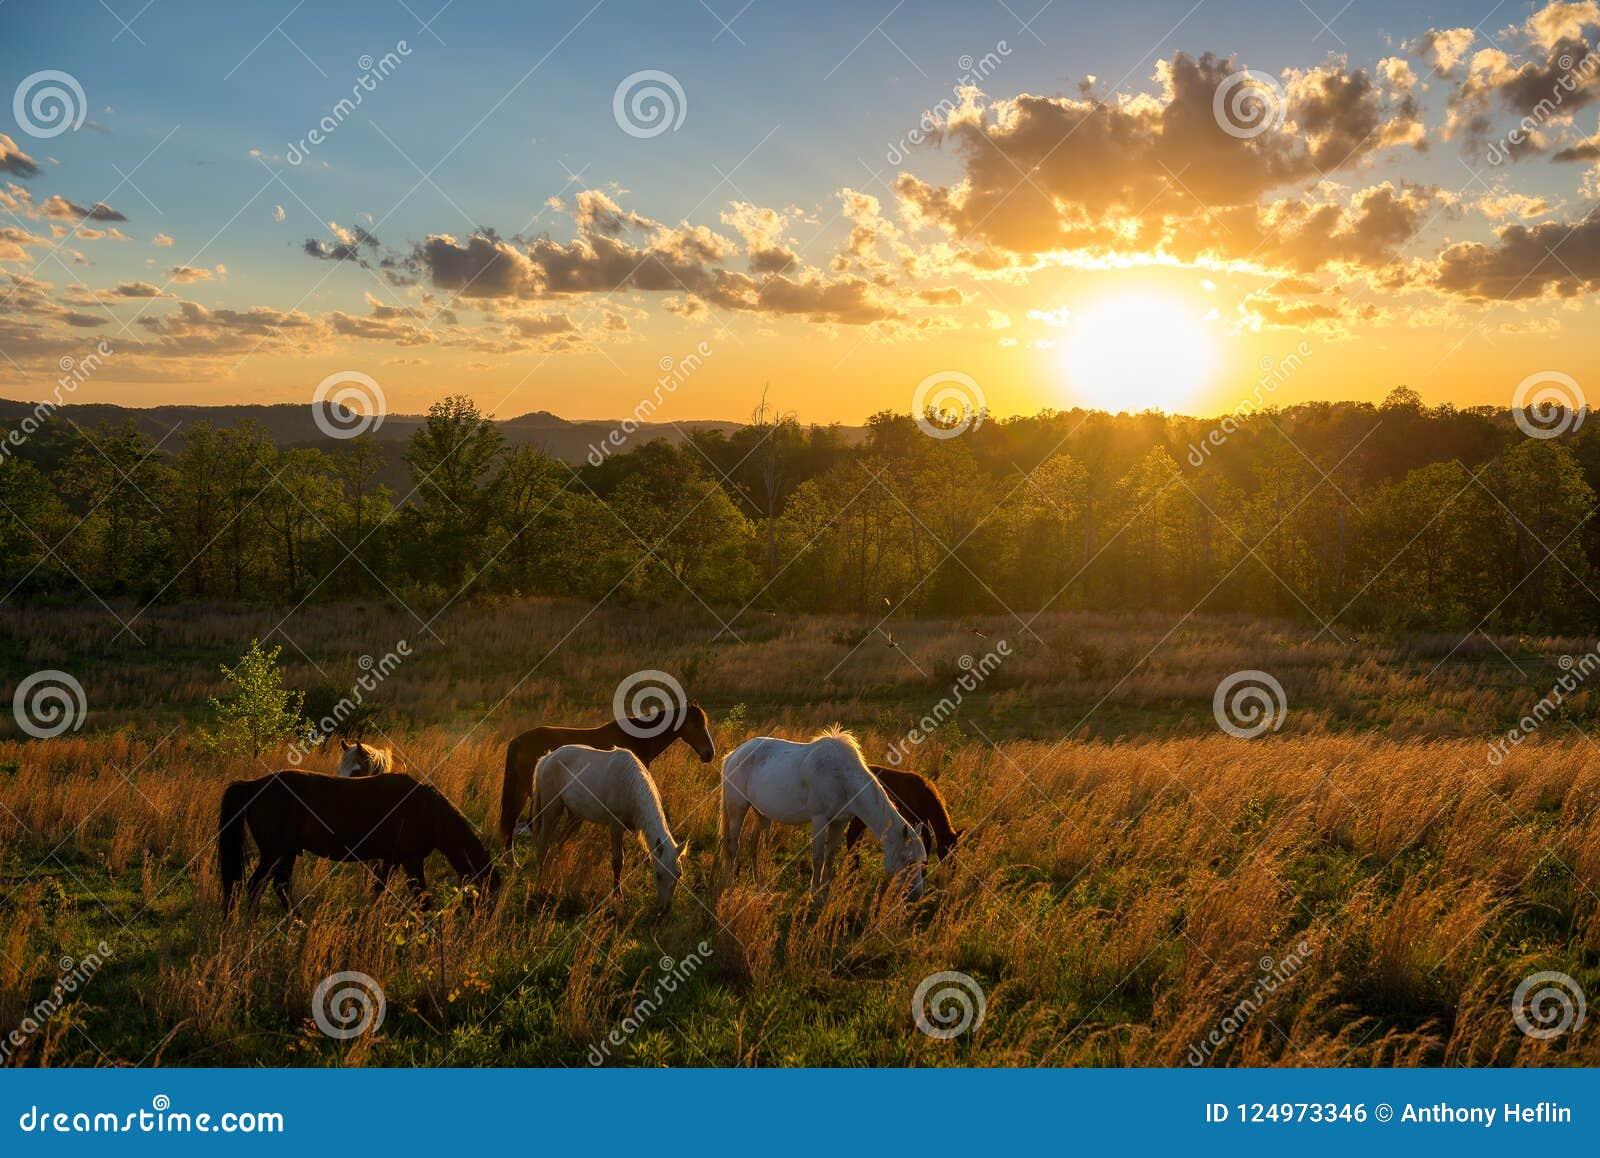 Vrije waaierpaarden, de zomerzonsondergang, Kentucky